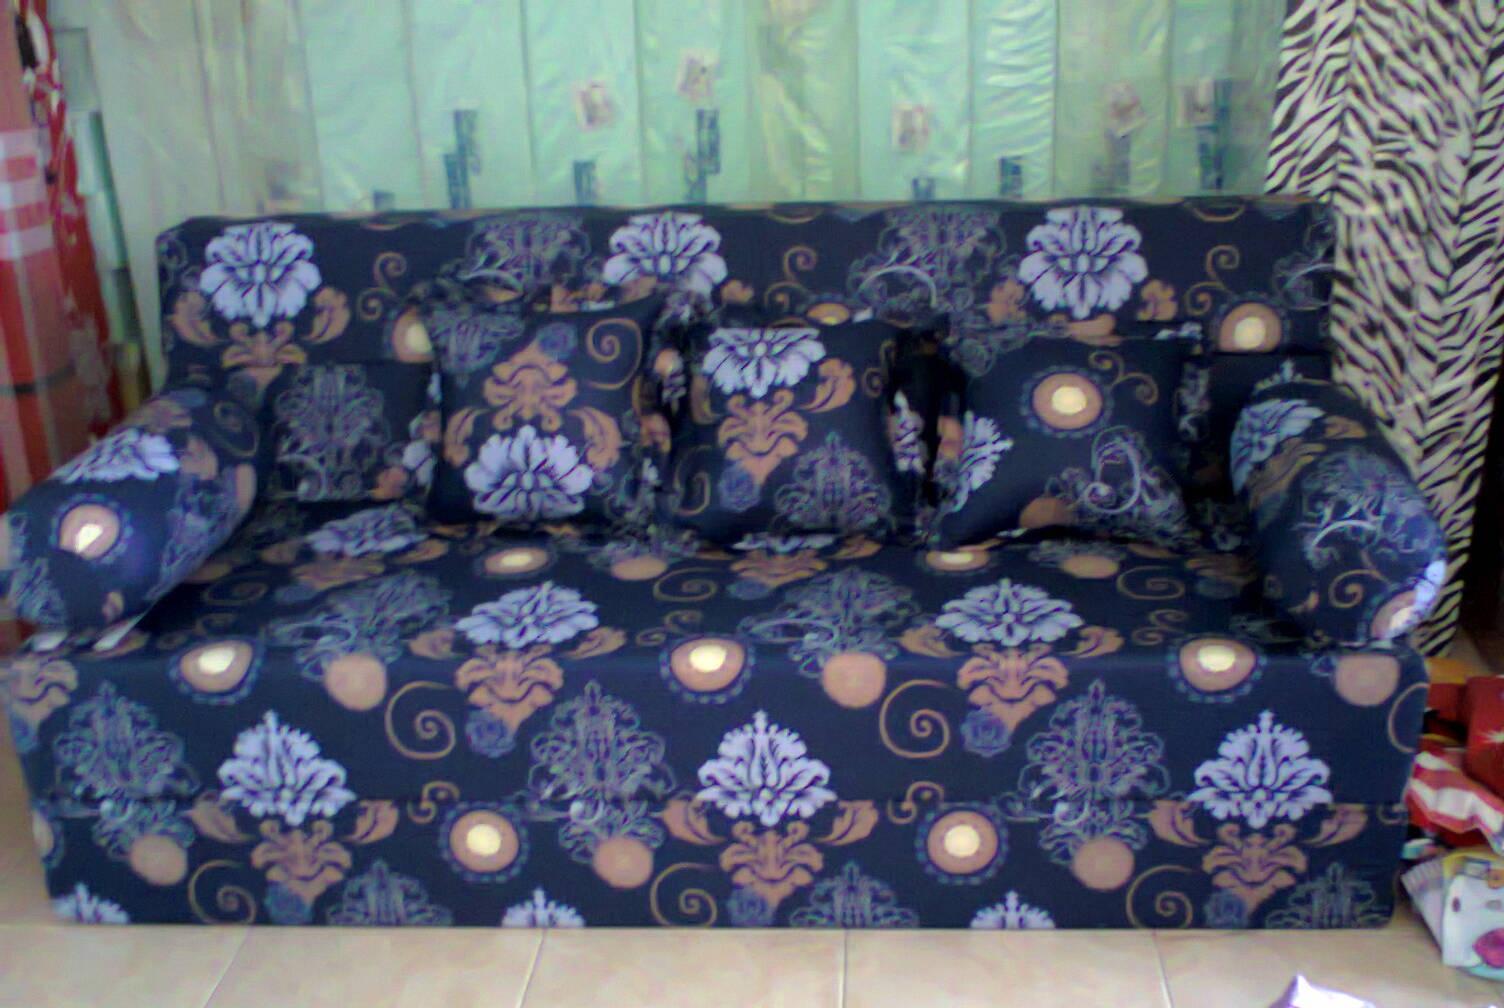 Sofa Bed Inoac Murah 200x160x20 Kasur Busa Murah